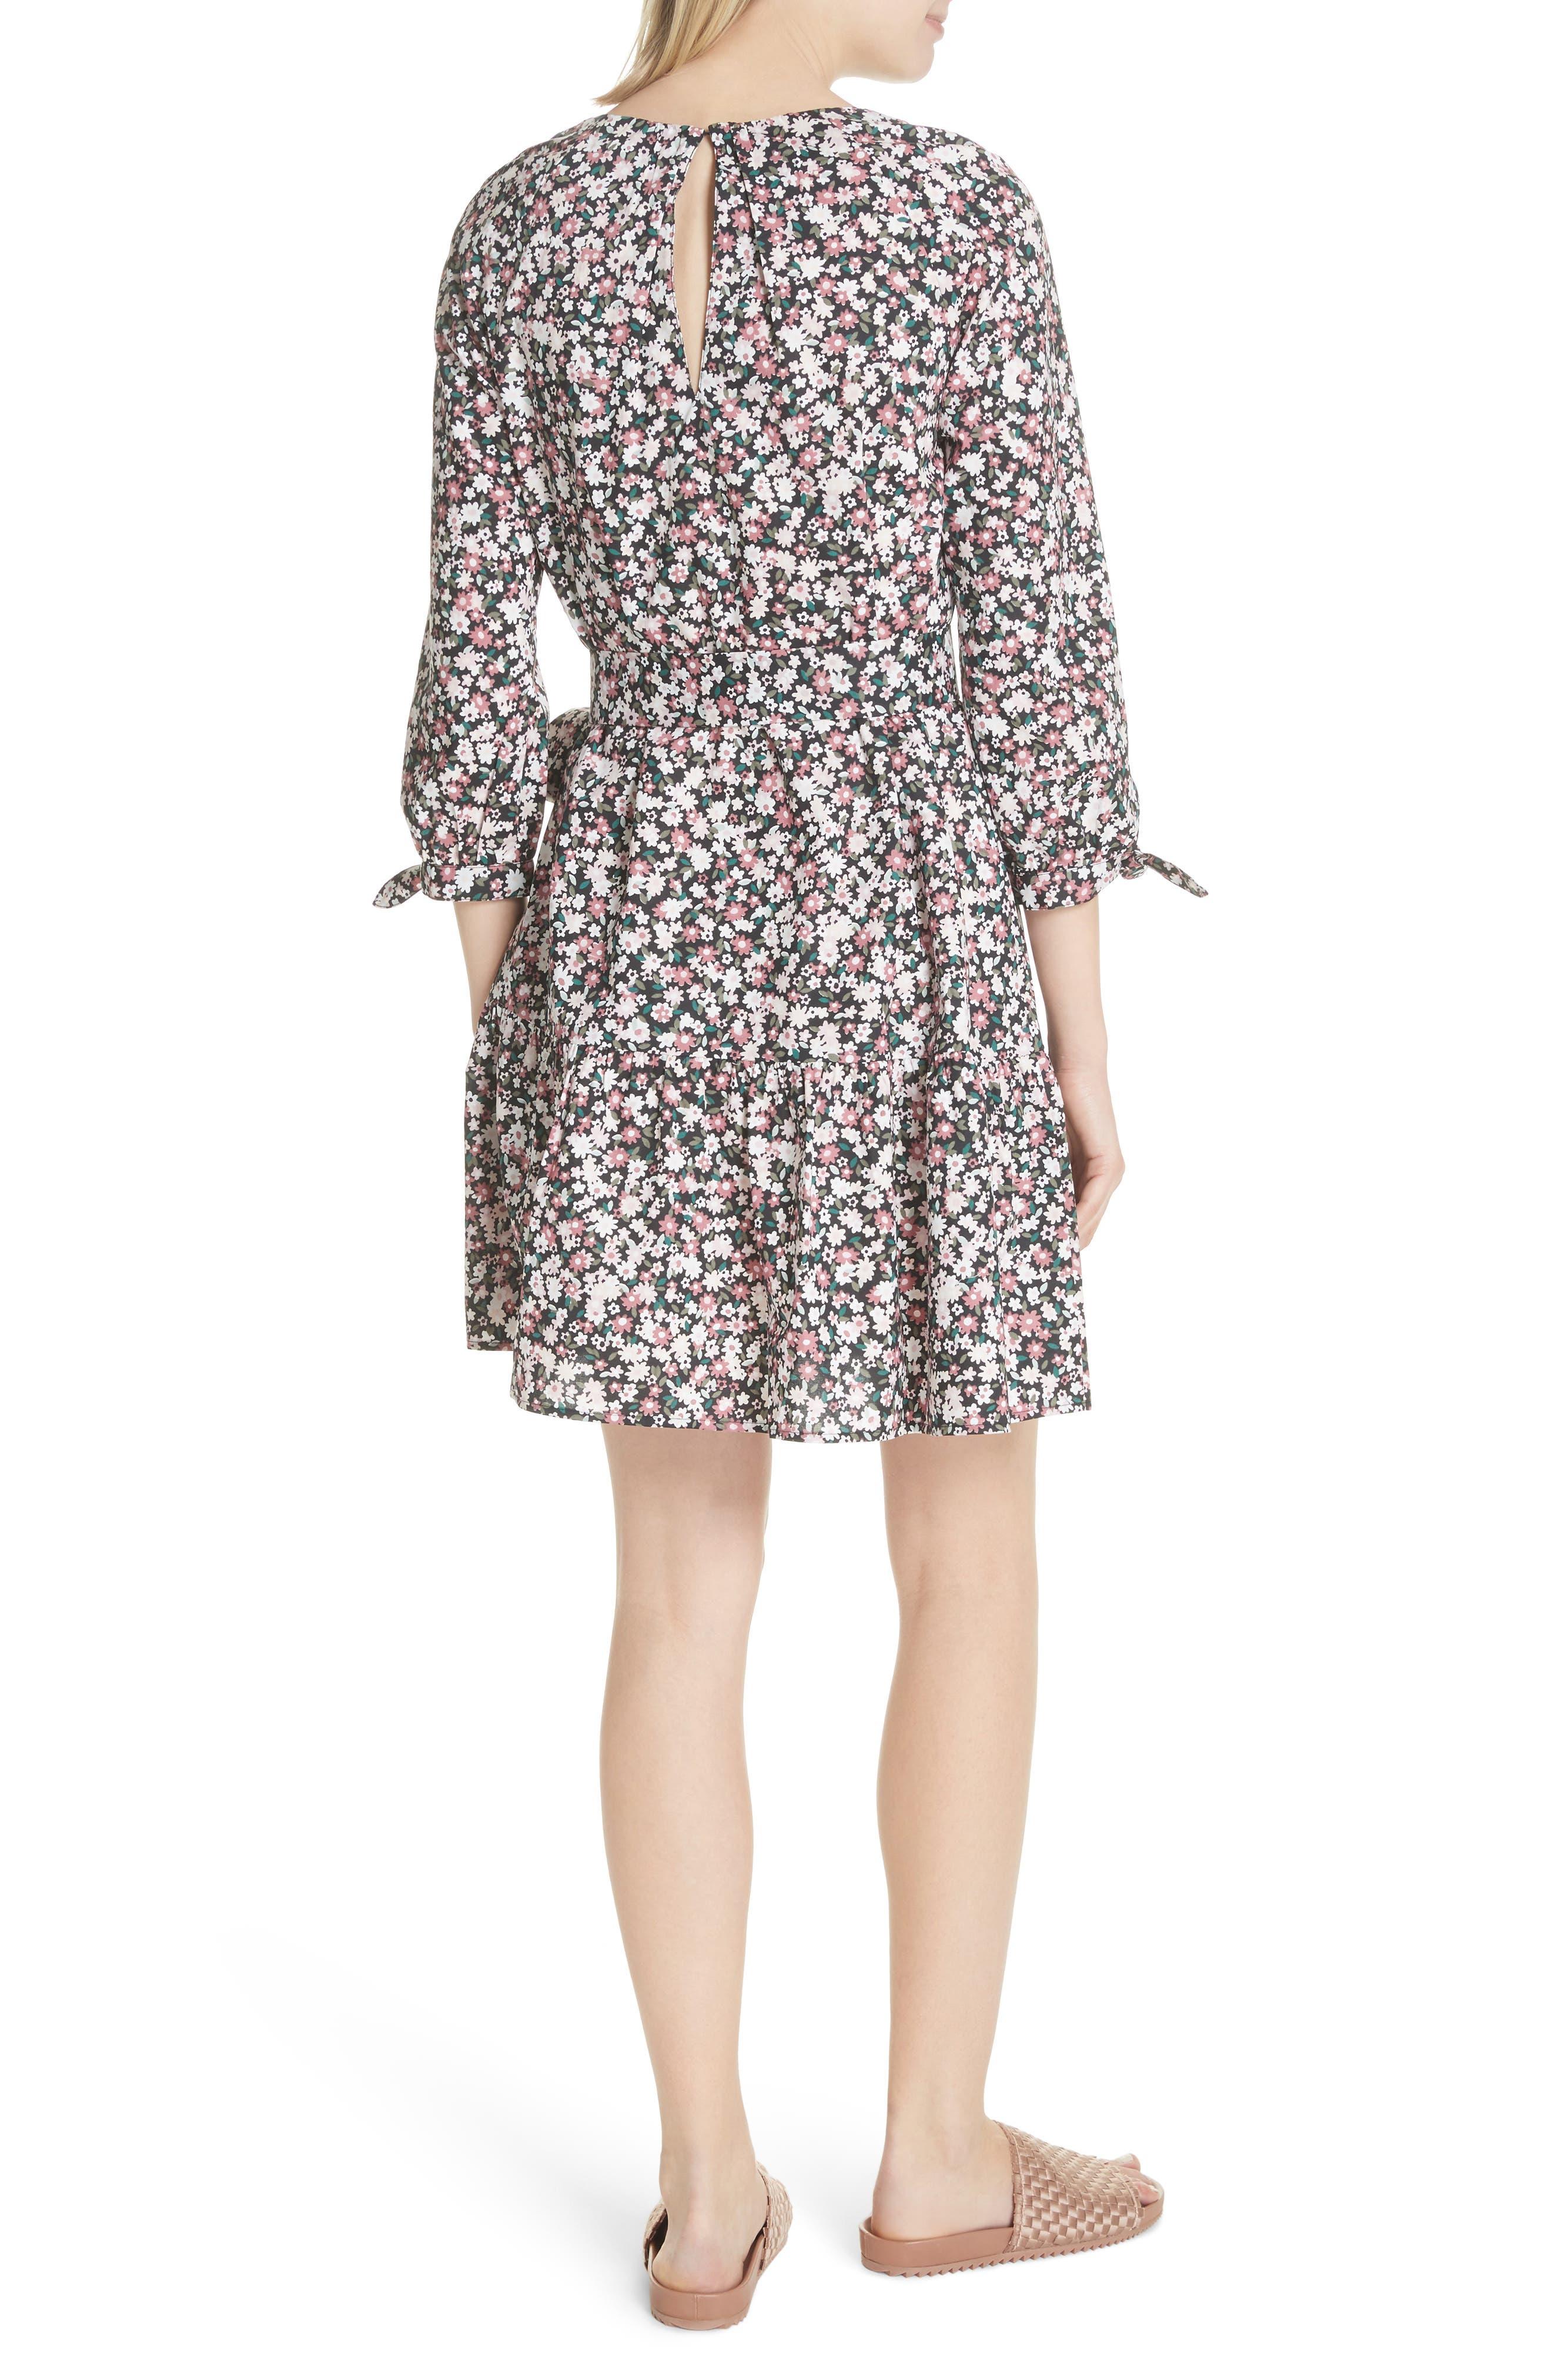 wildflower poplin dress,                             Alternate thumbnail 2, color,                             Black